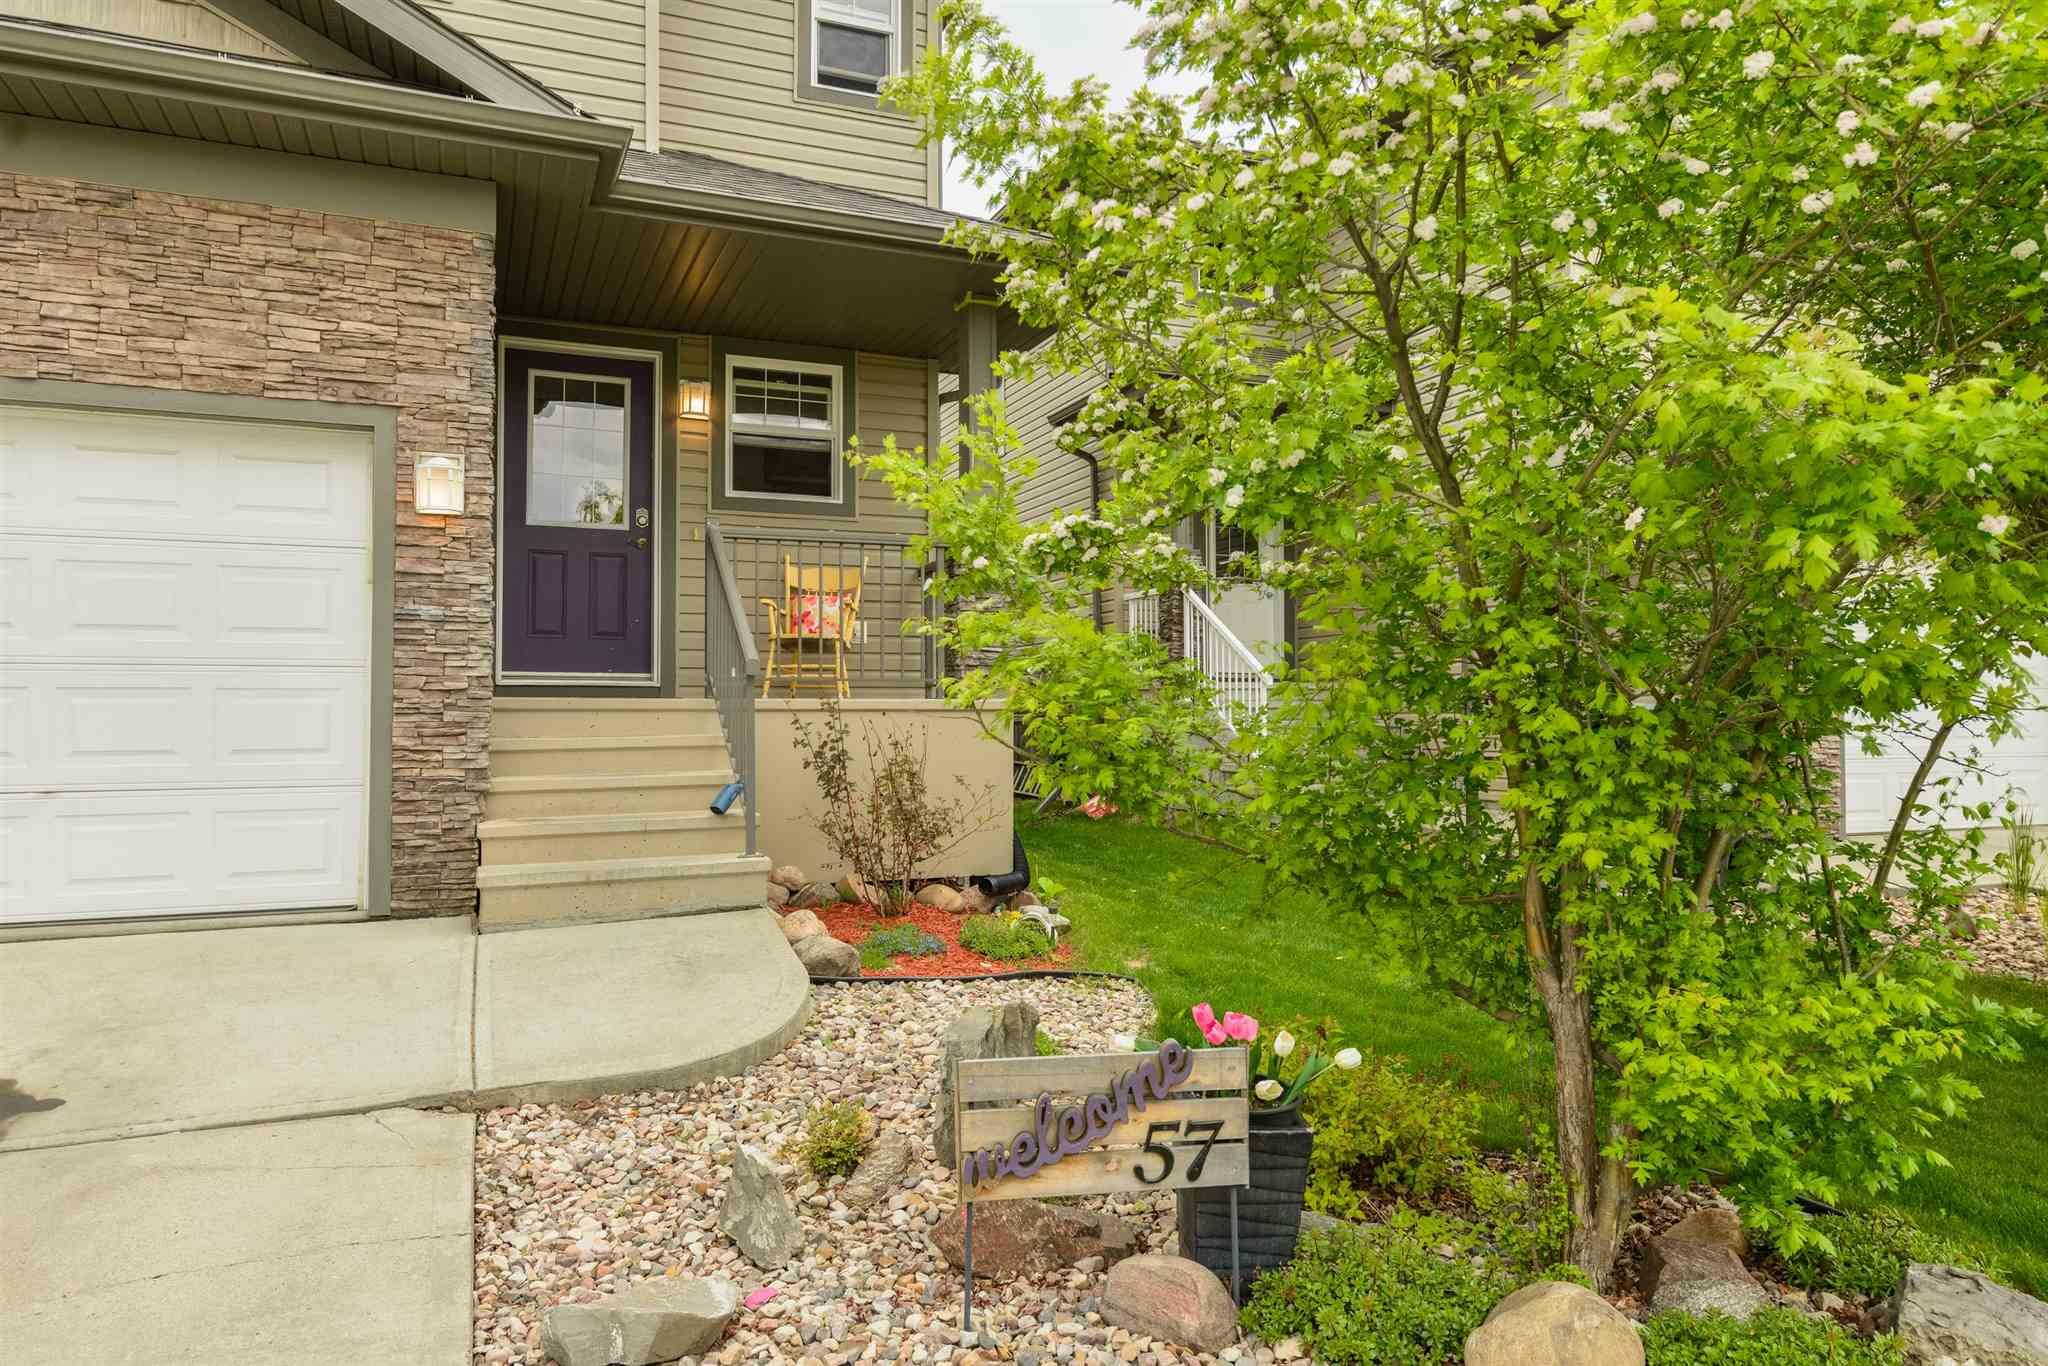 Main Photo: 57 HARTWICK Loop: Spruce Grove House Half Duplex for sale : MLS®# E4249161